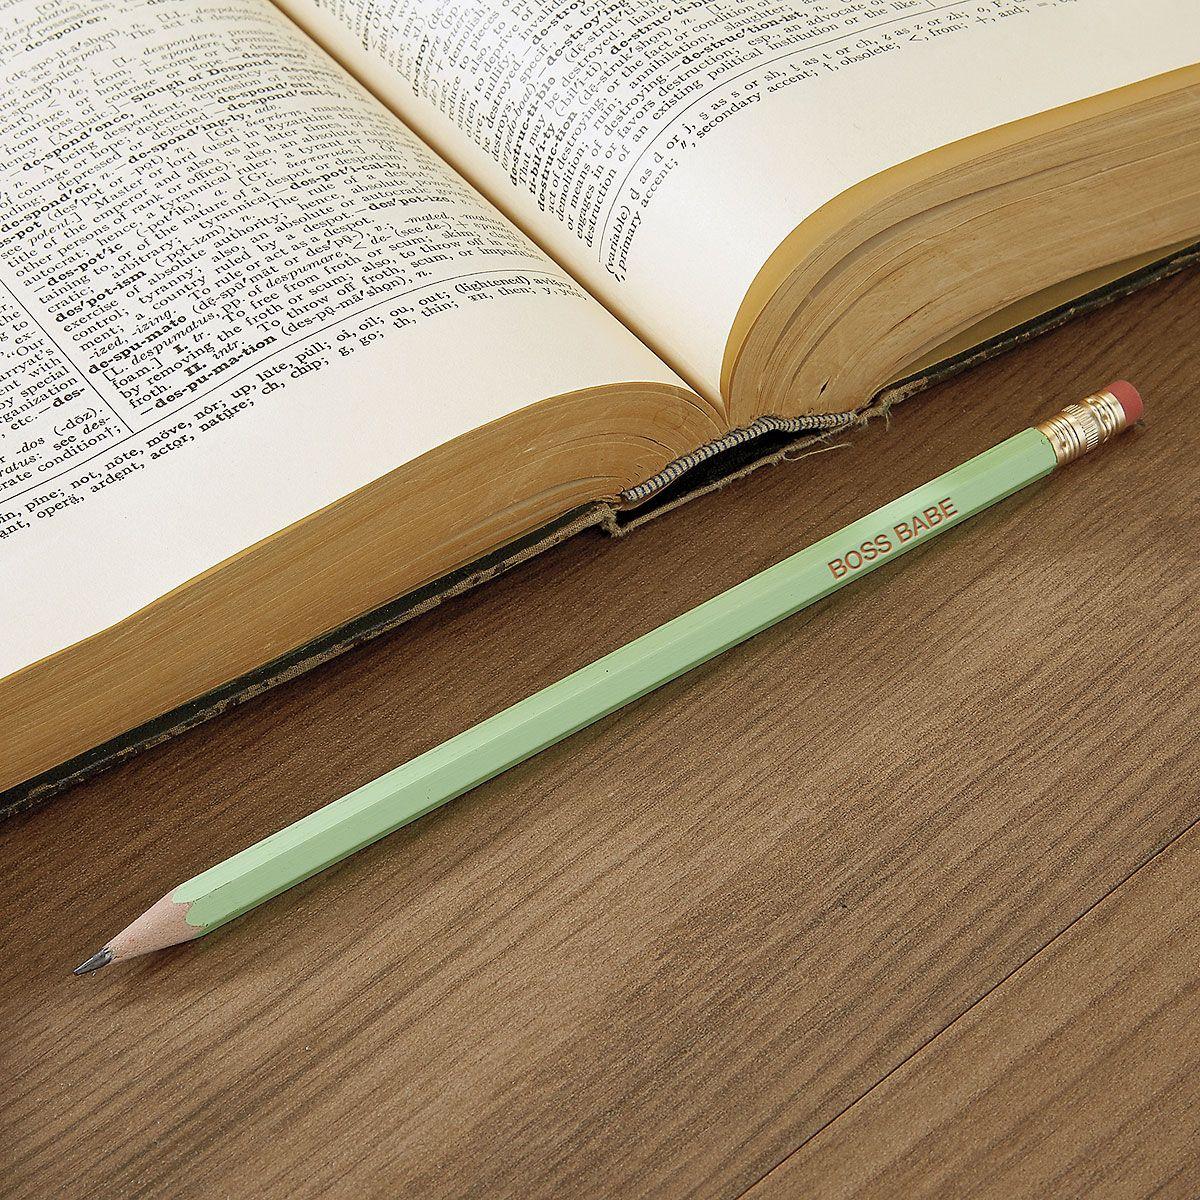 #2 Hardwood Pencils - Compliment